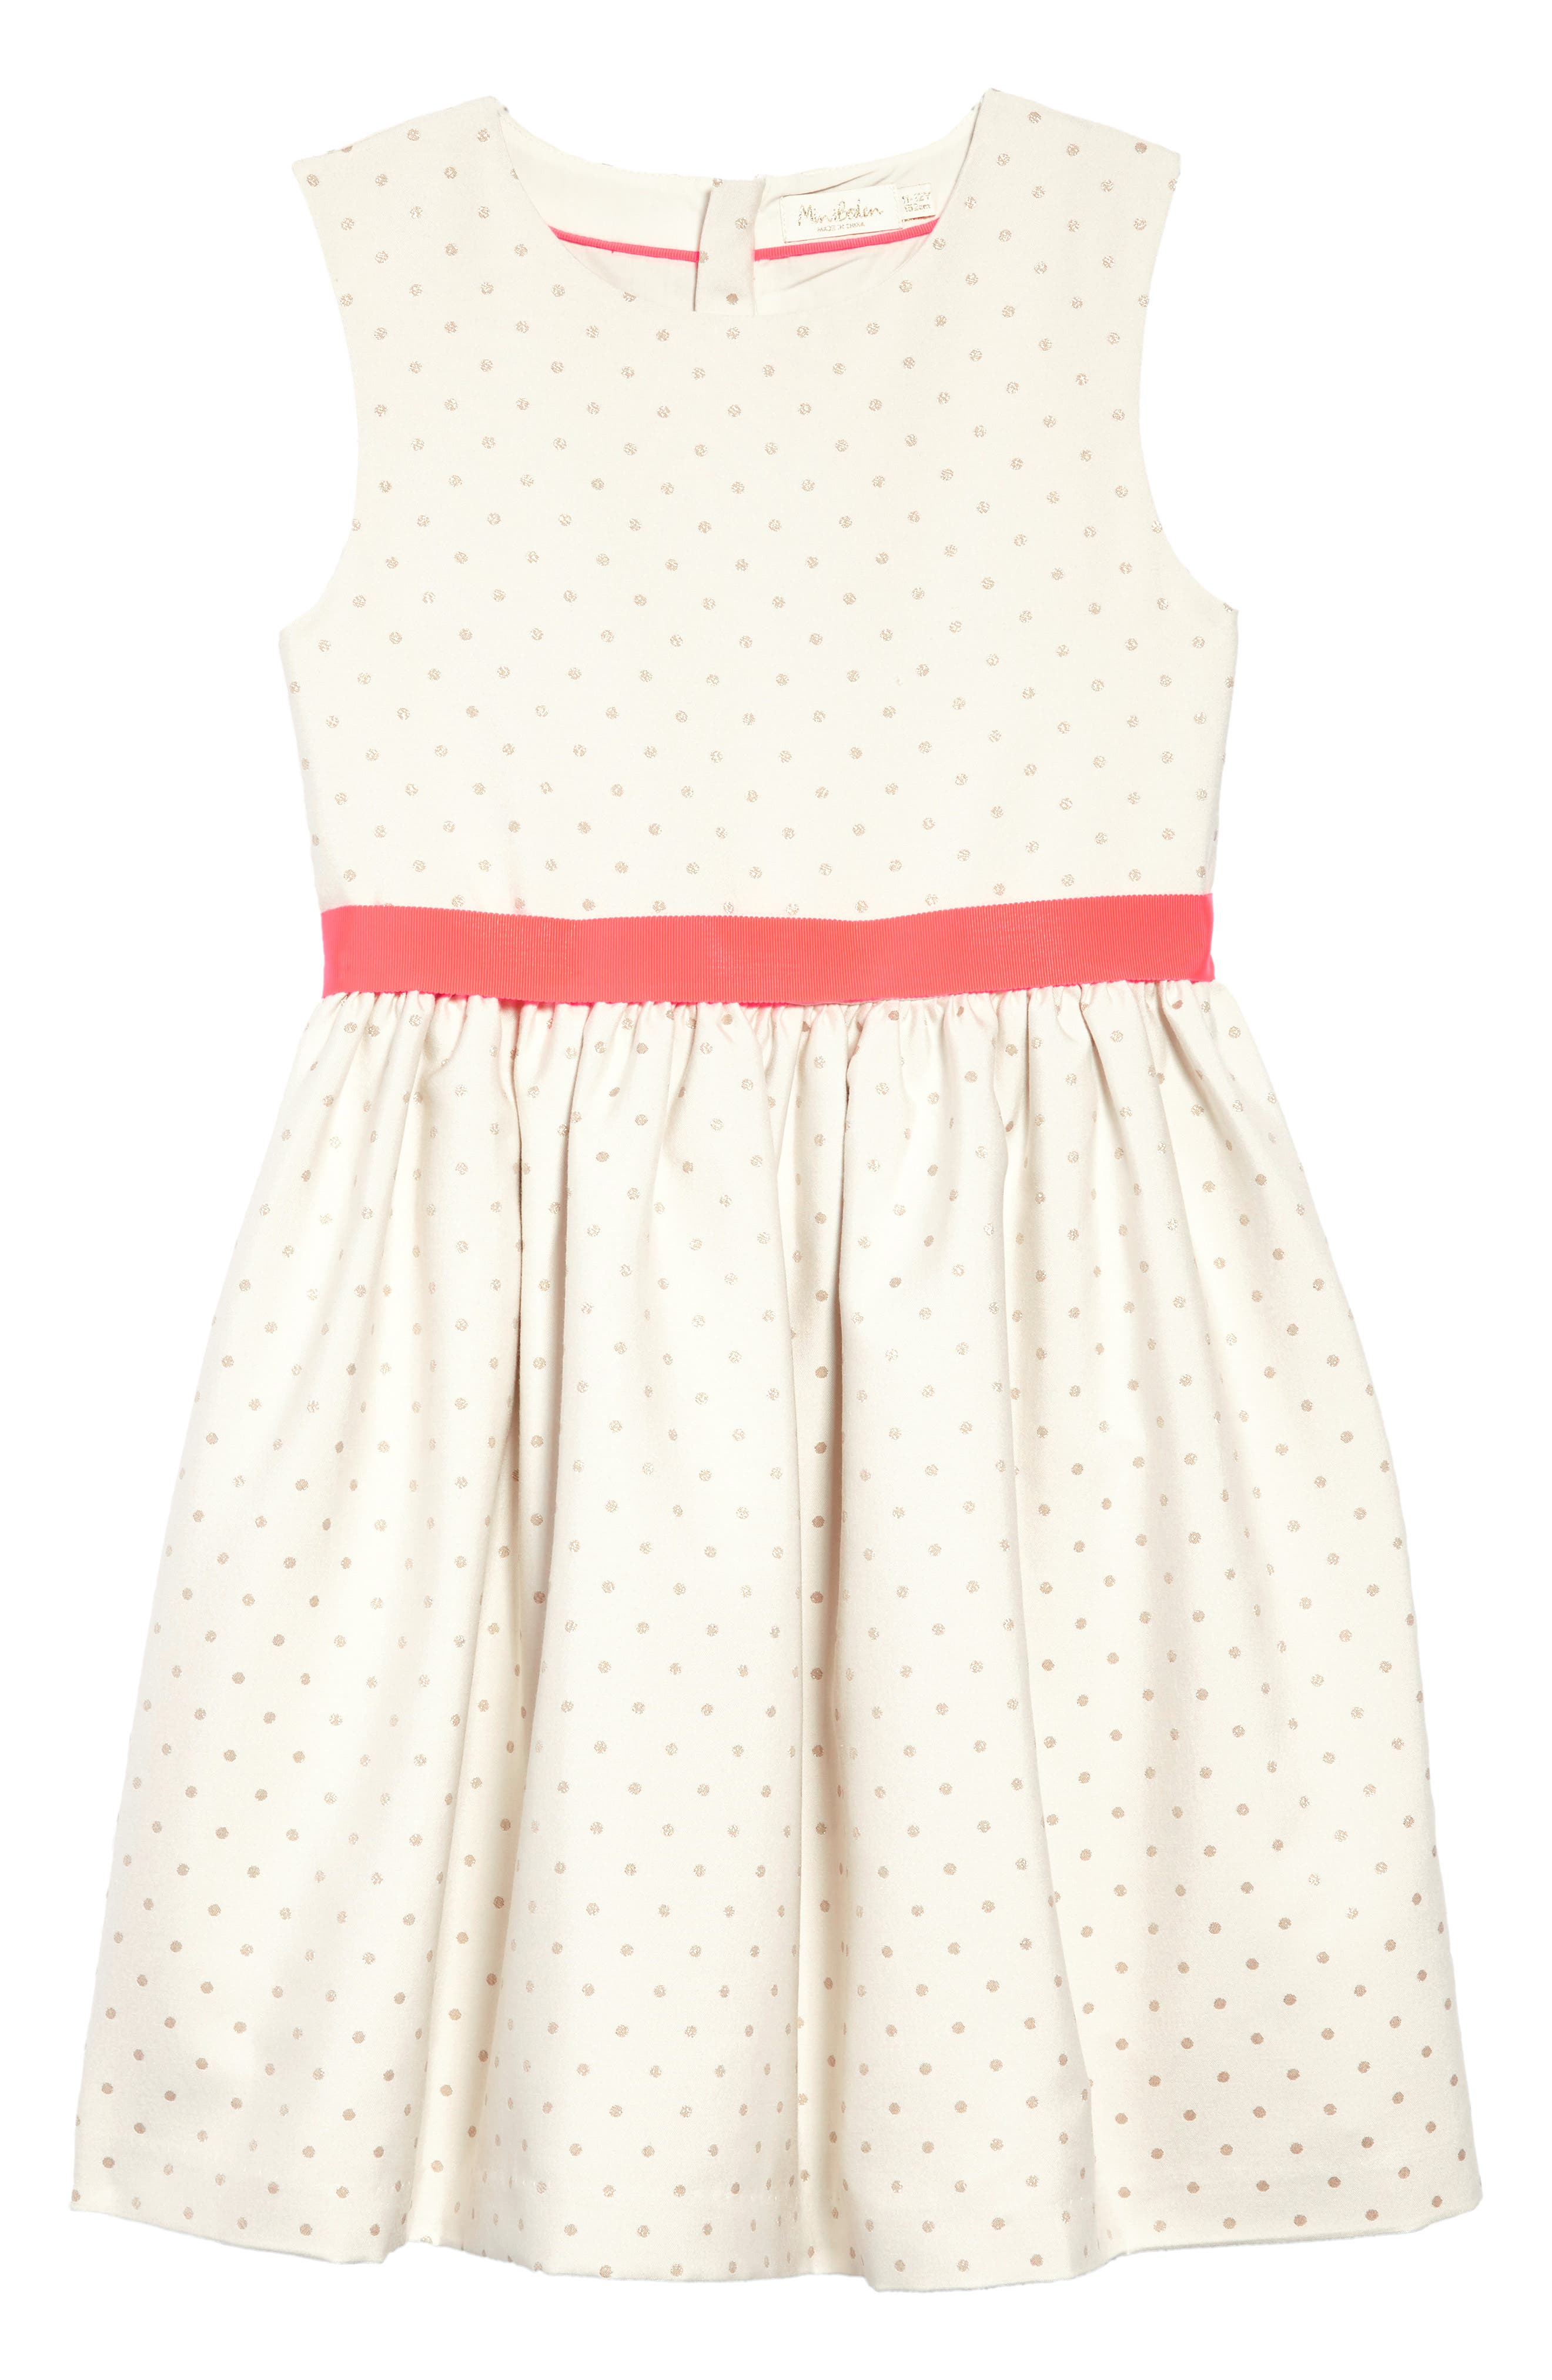 MINI BODEN Metallic Dot Fit & Flare Dress, Main, color, 909